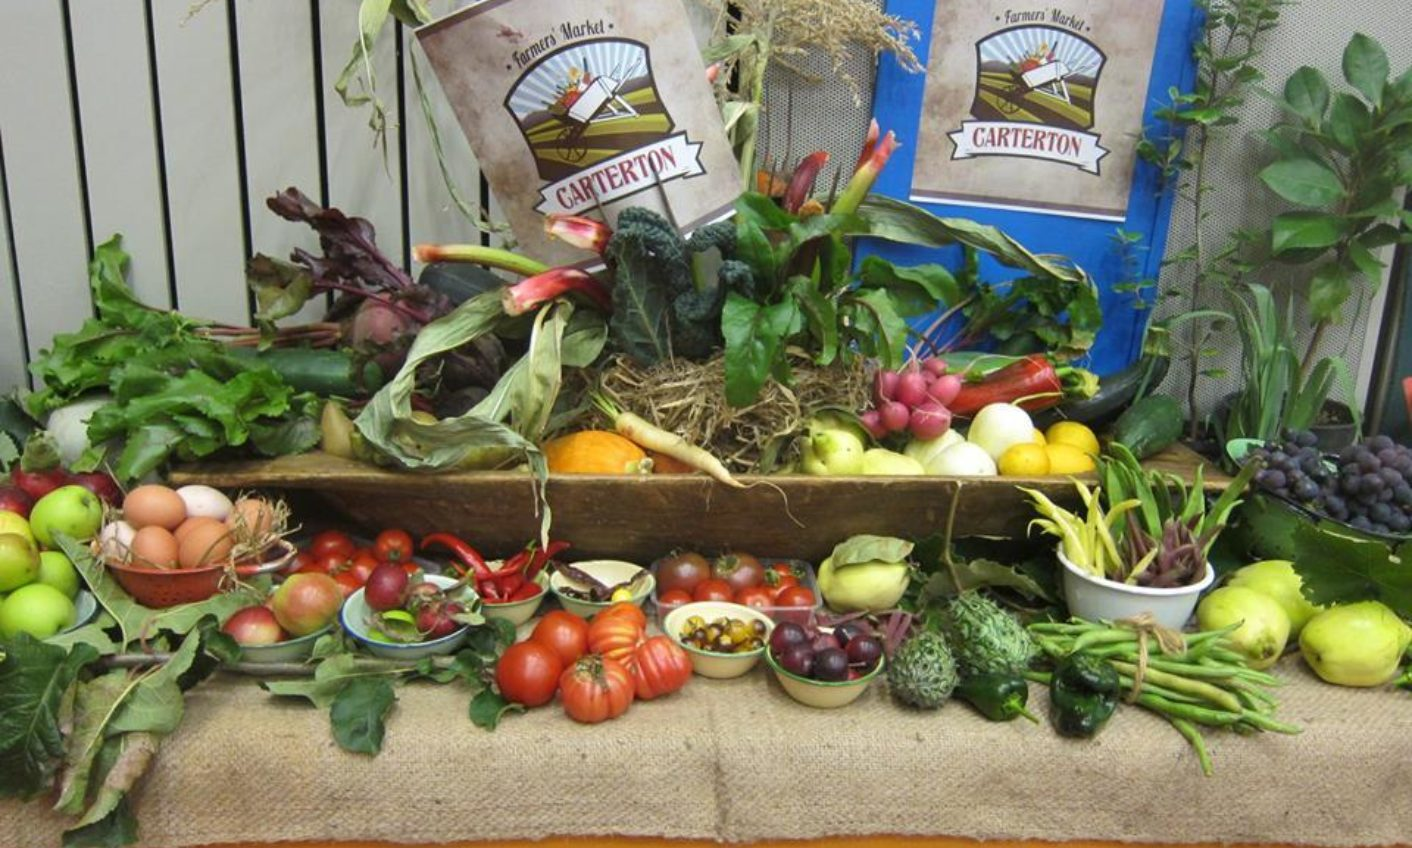 Carterton Farmers Market